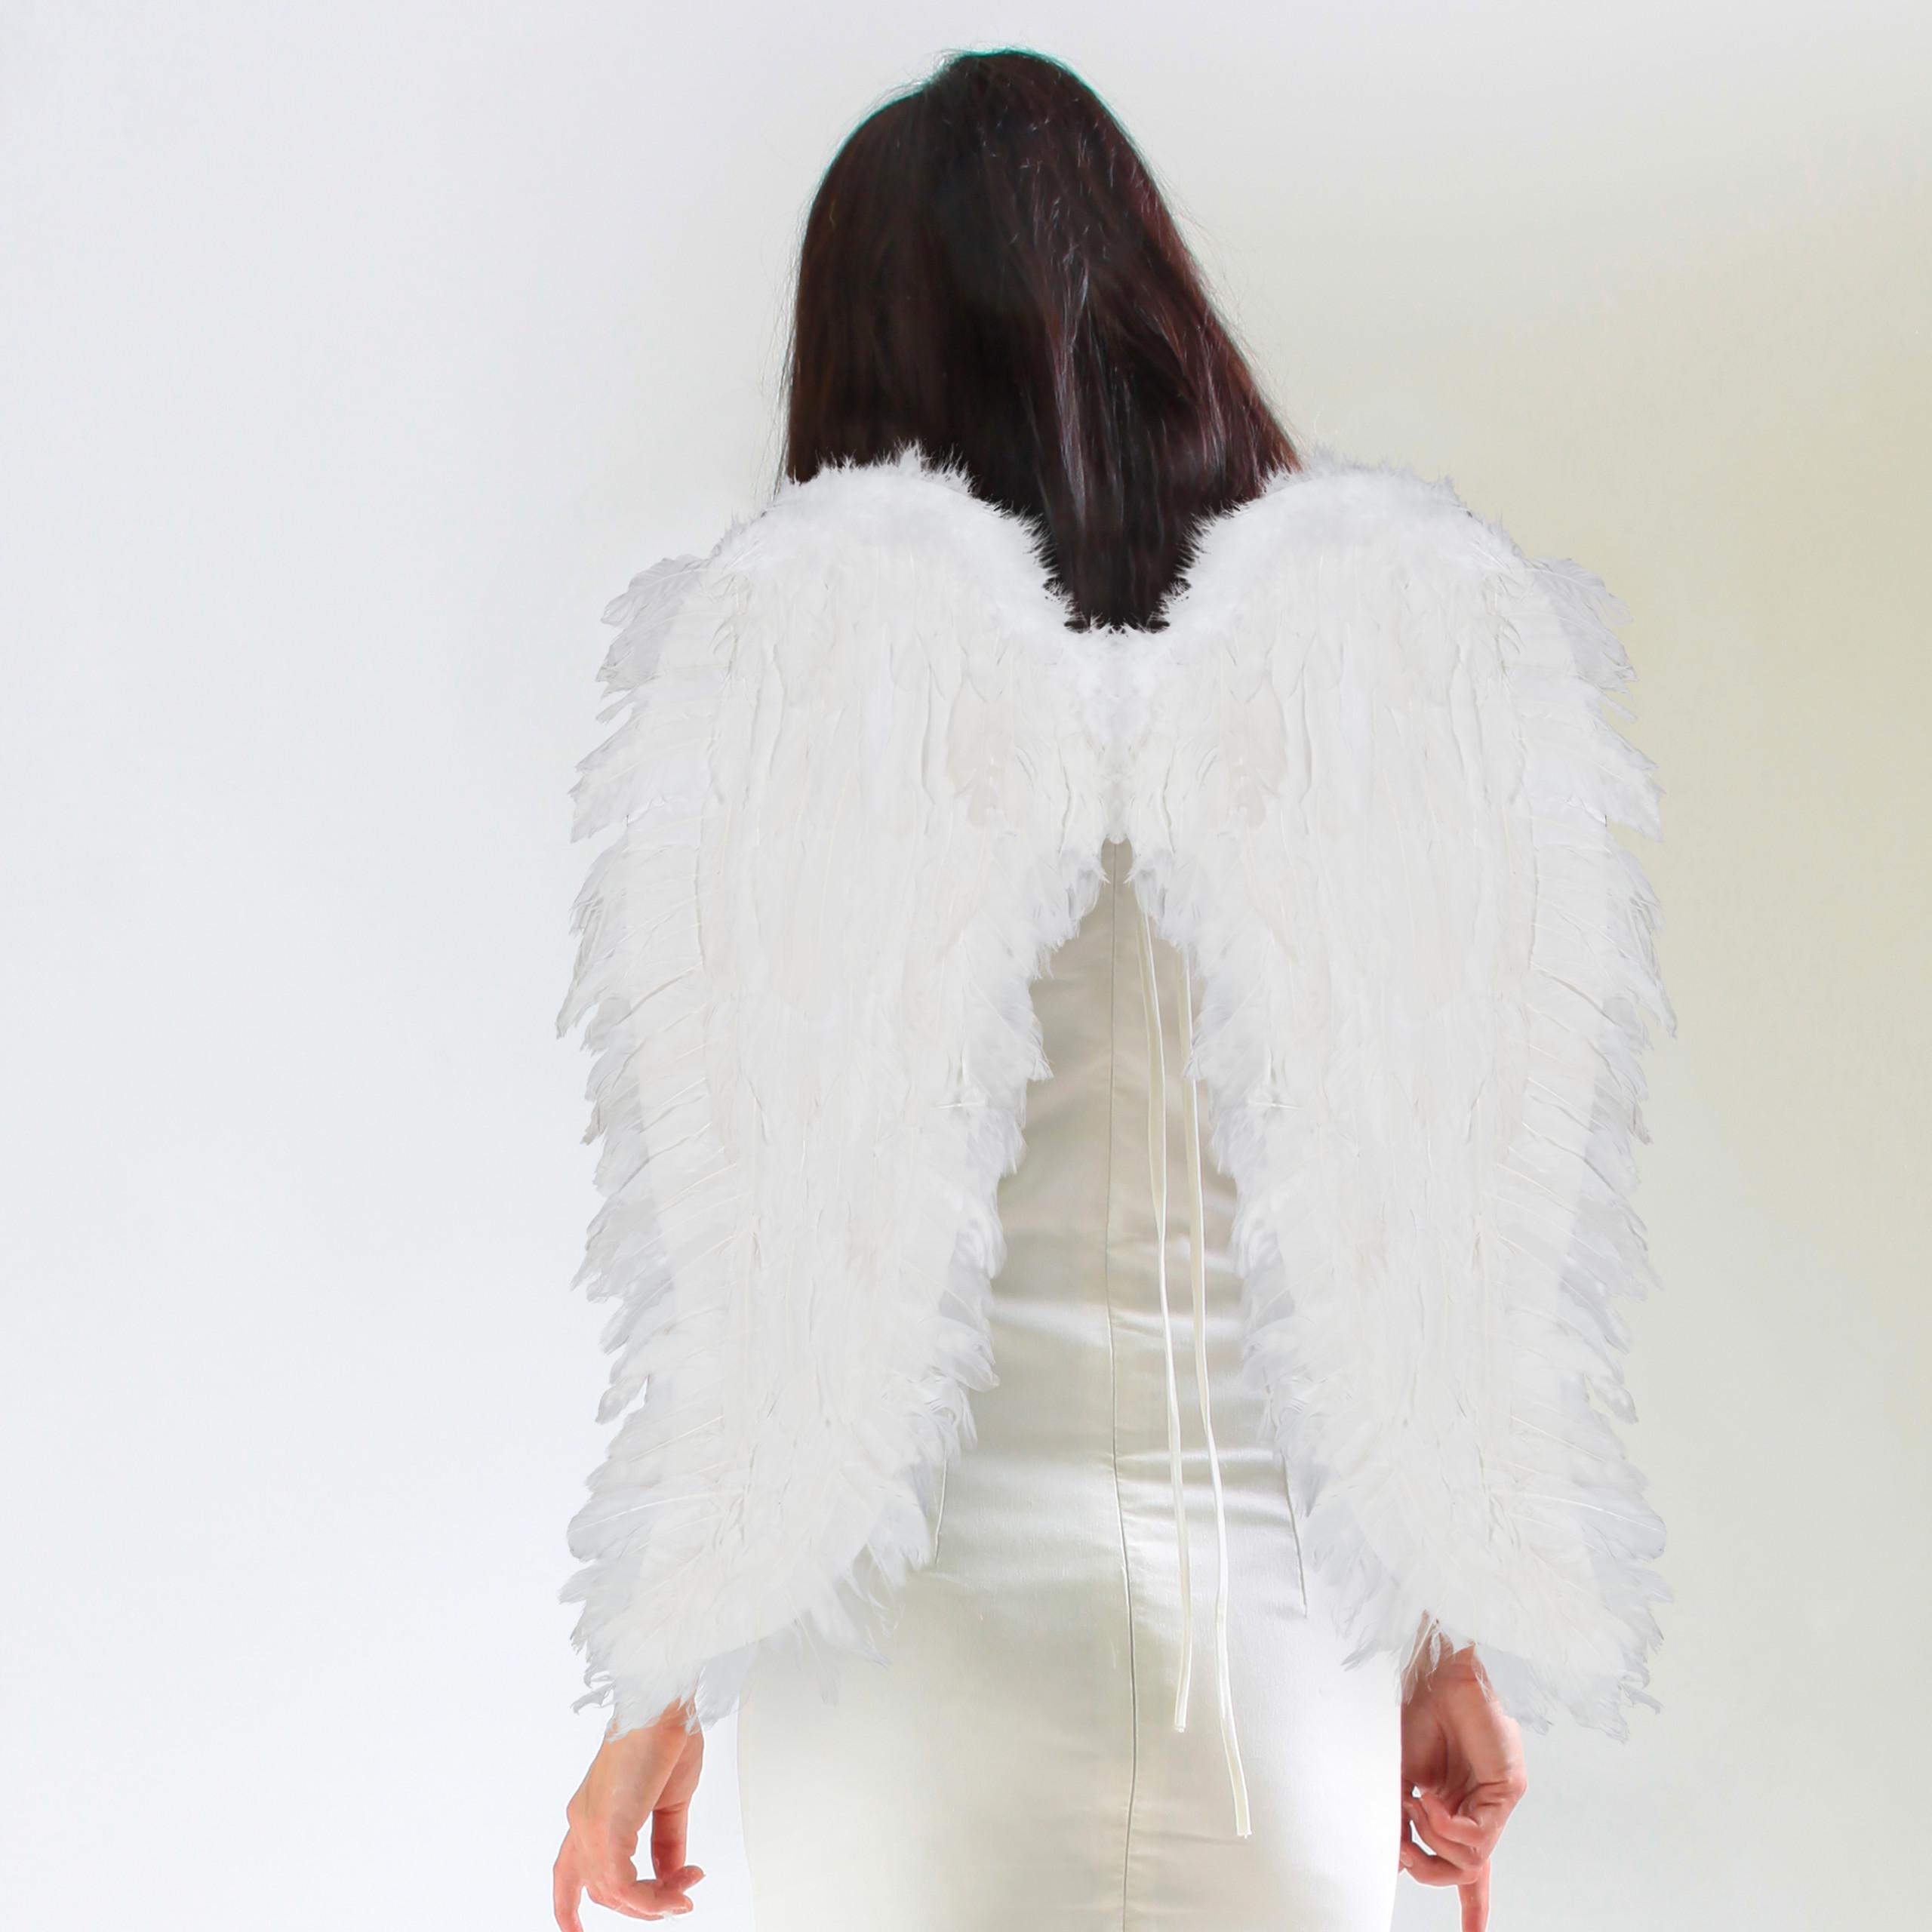 vleugels-verkleedkleding-XXL-engelenvleugels-engelkostuum-kunstveren miniatuur 3